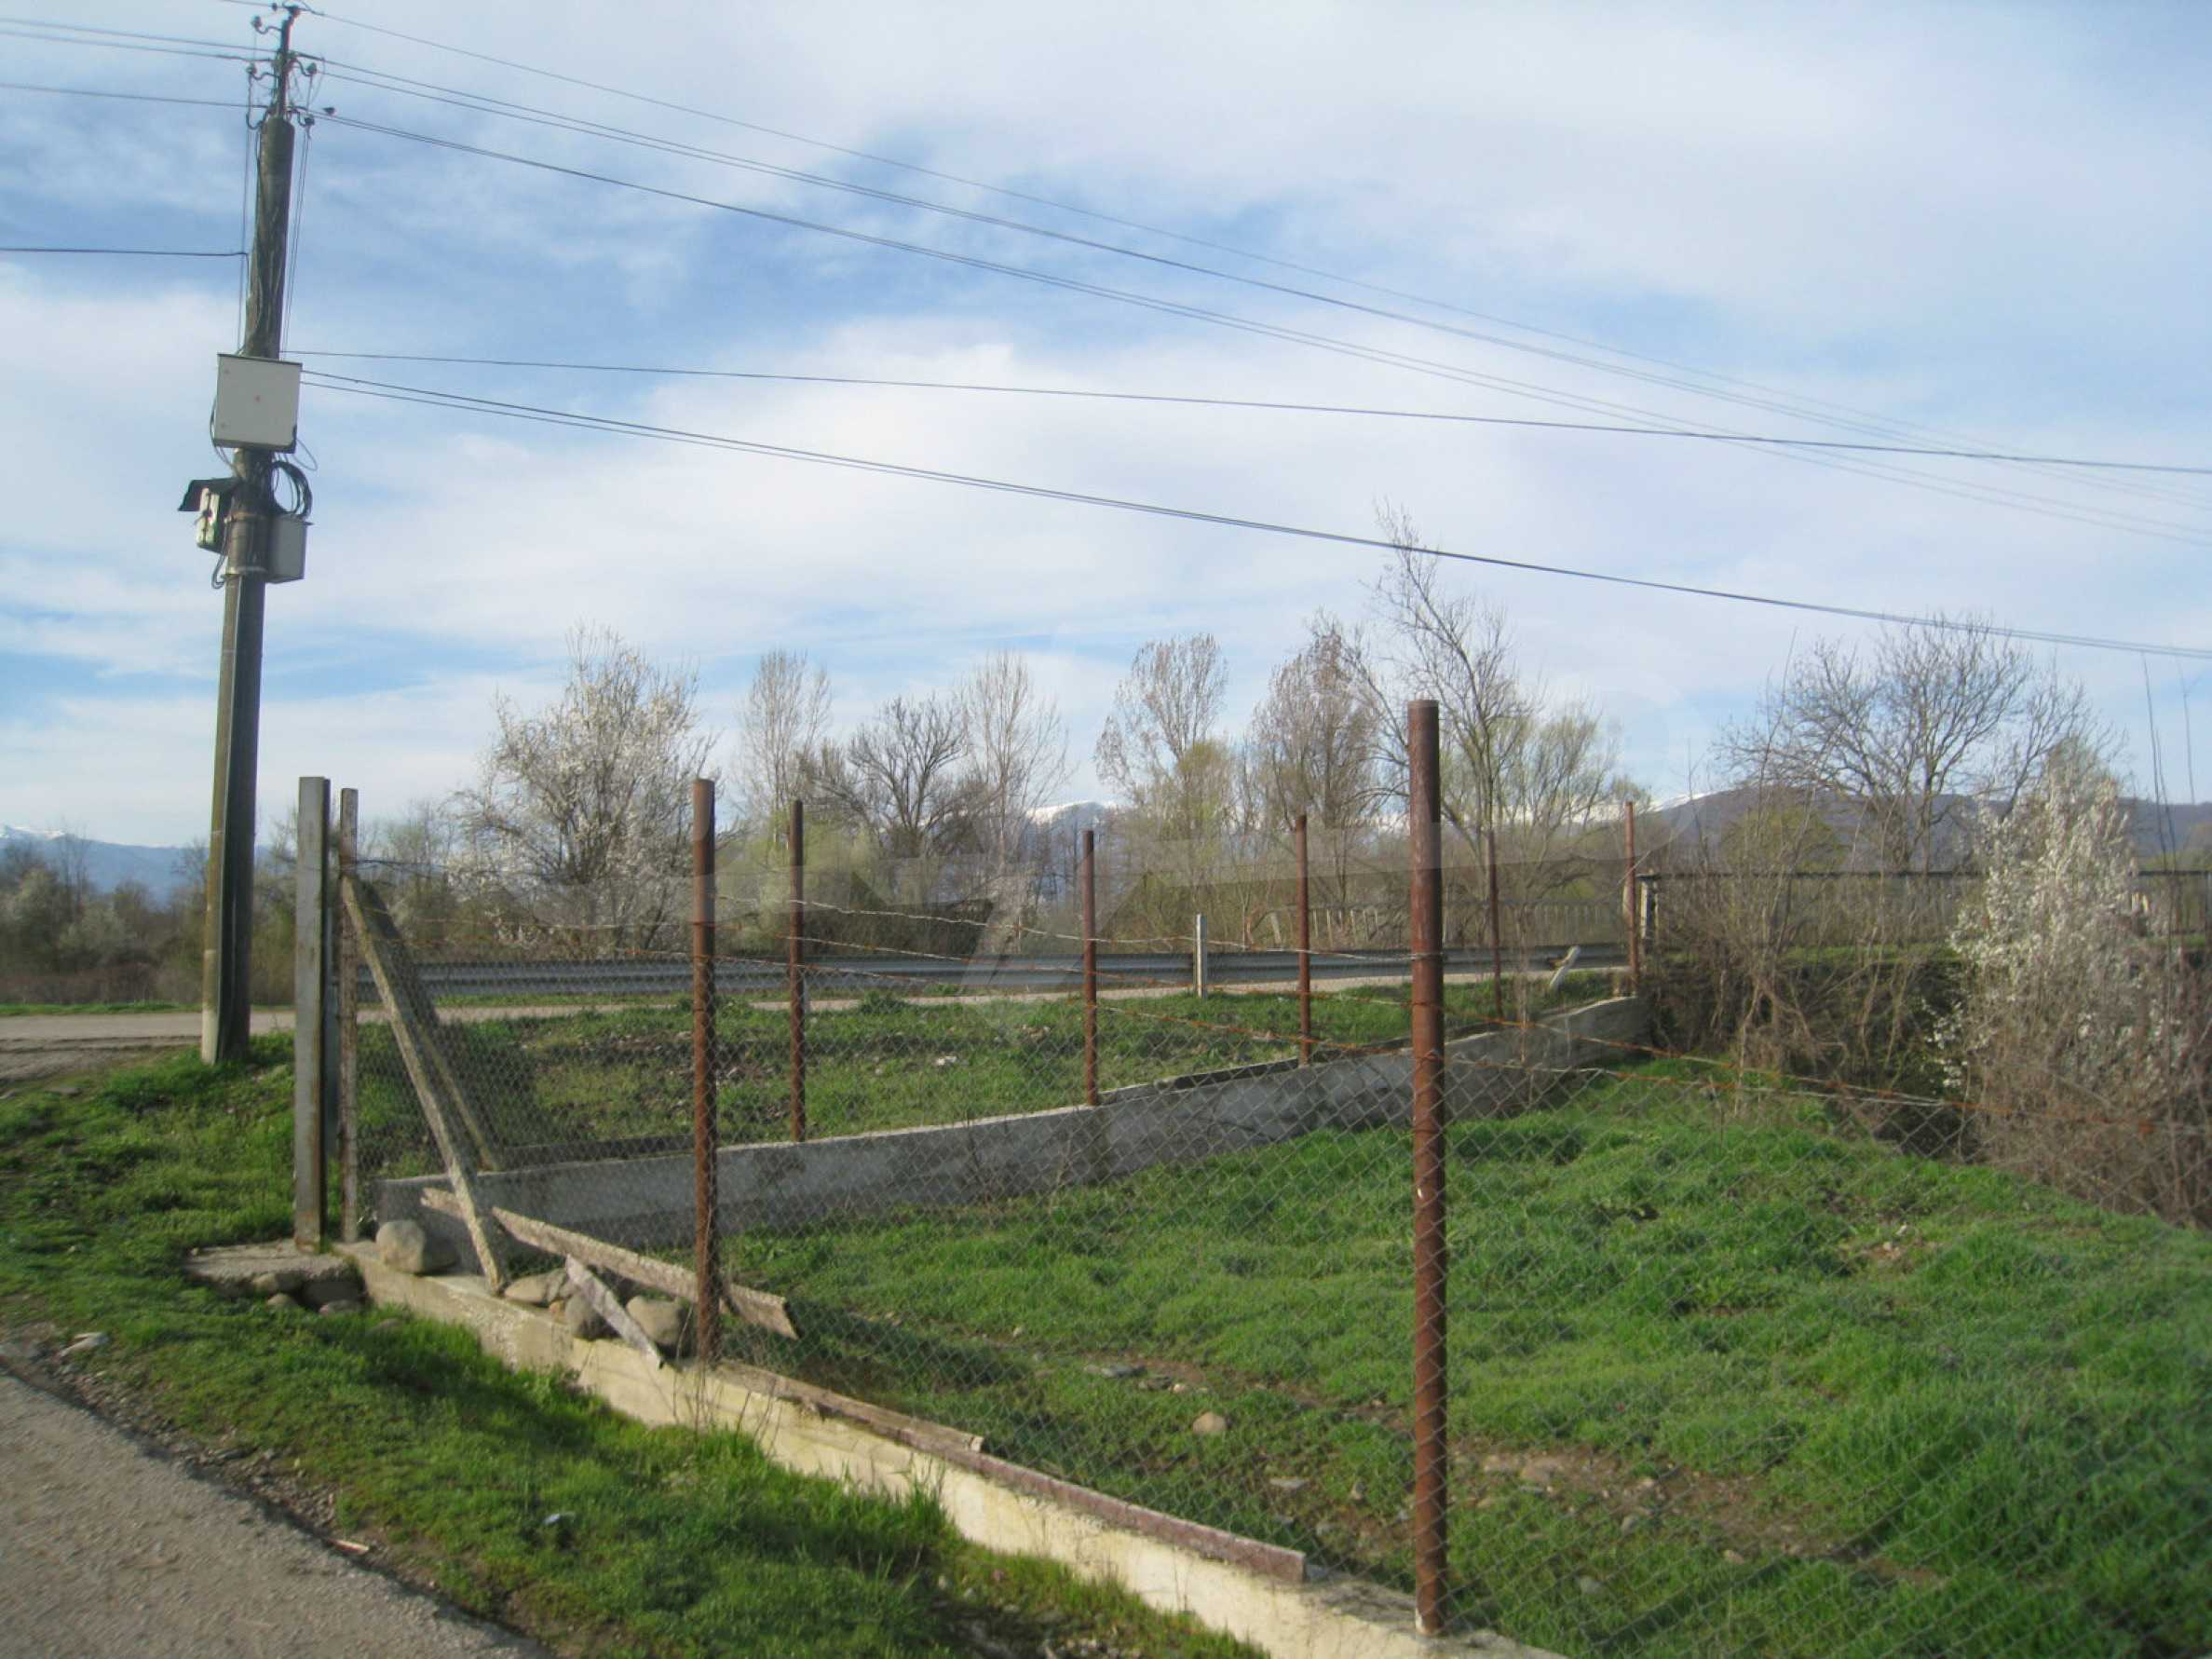 Fishpond, warehouses, residential areas and asphalt ground near Montana 48